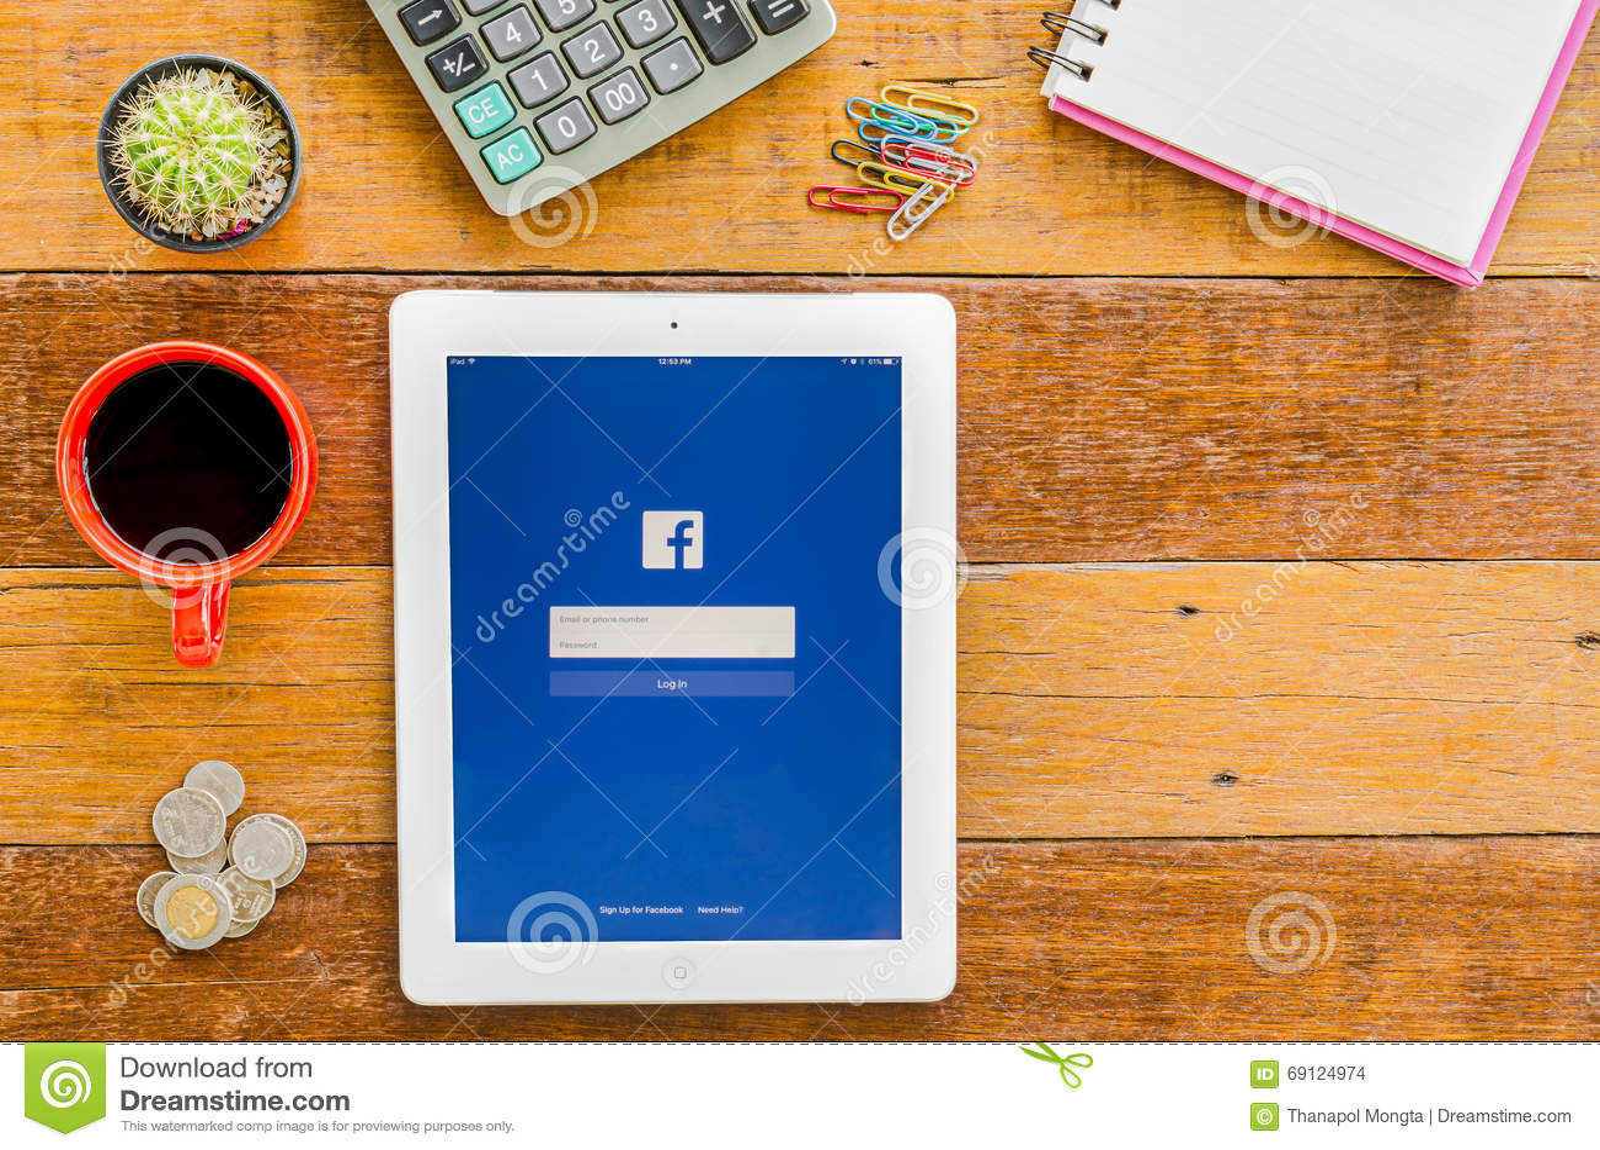 IPad 4 open Facebook application.